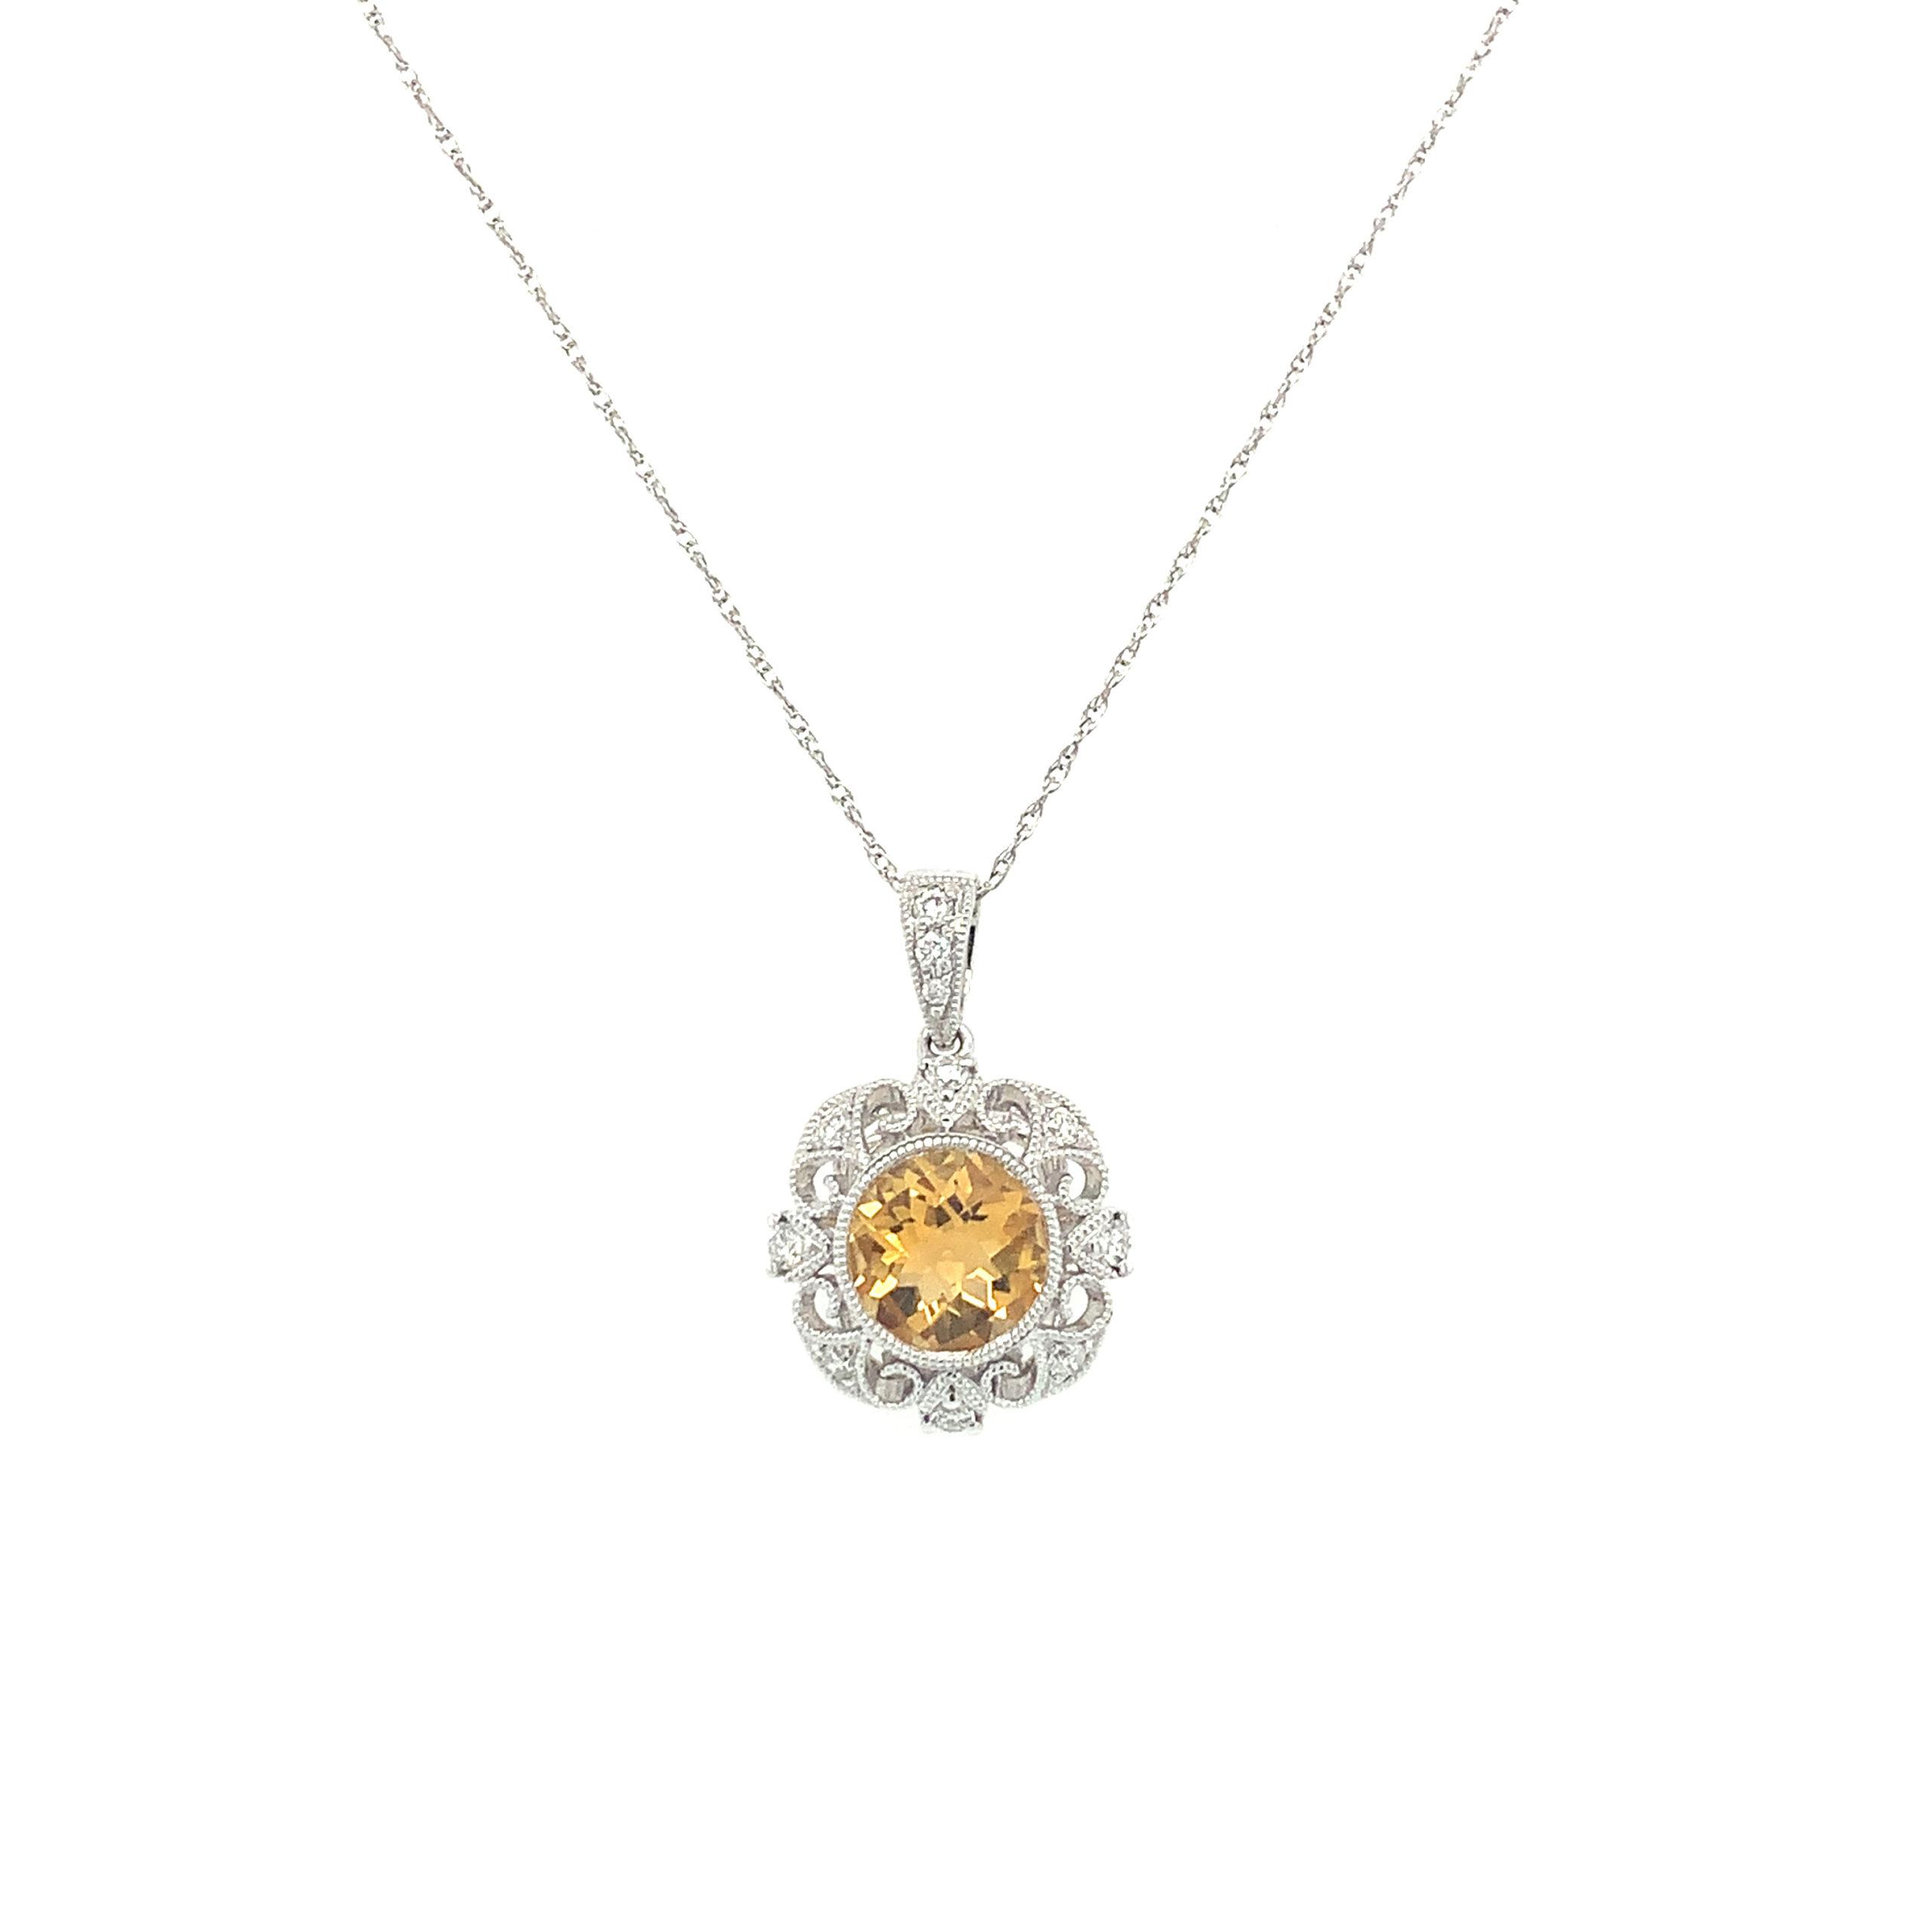 White Gold Citrine Pendant Necklace